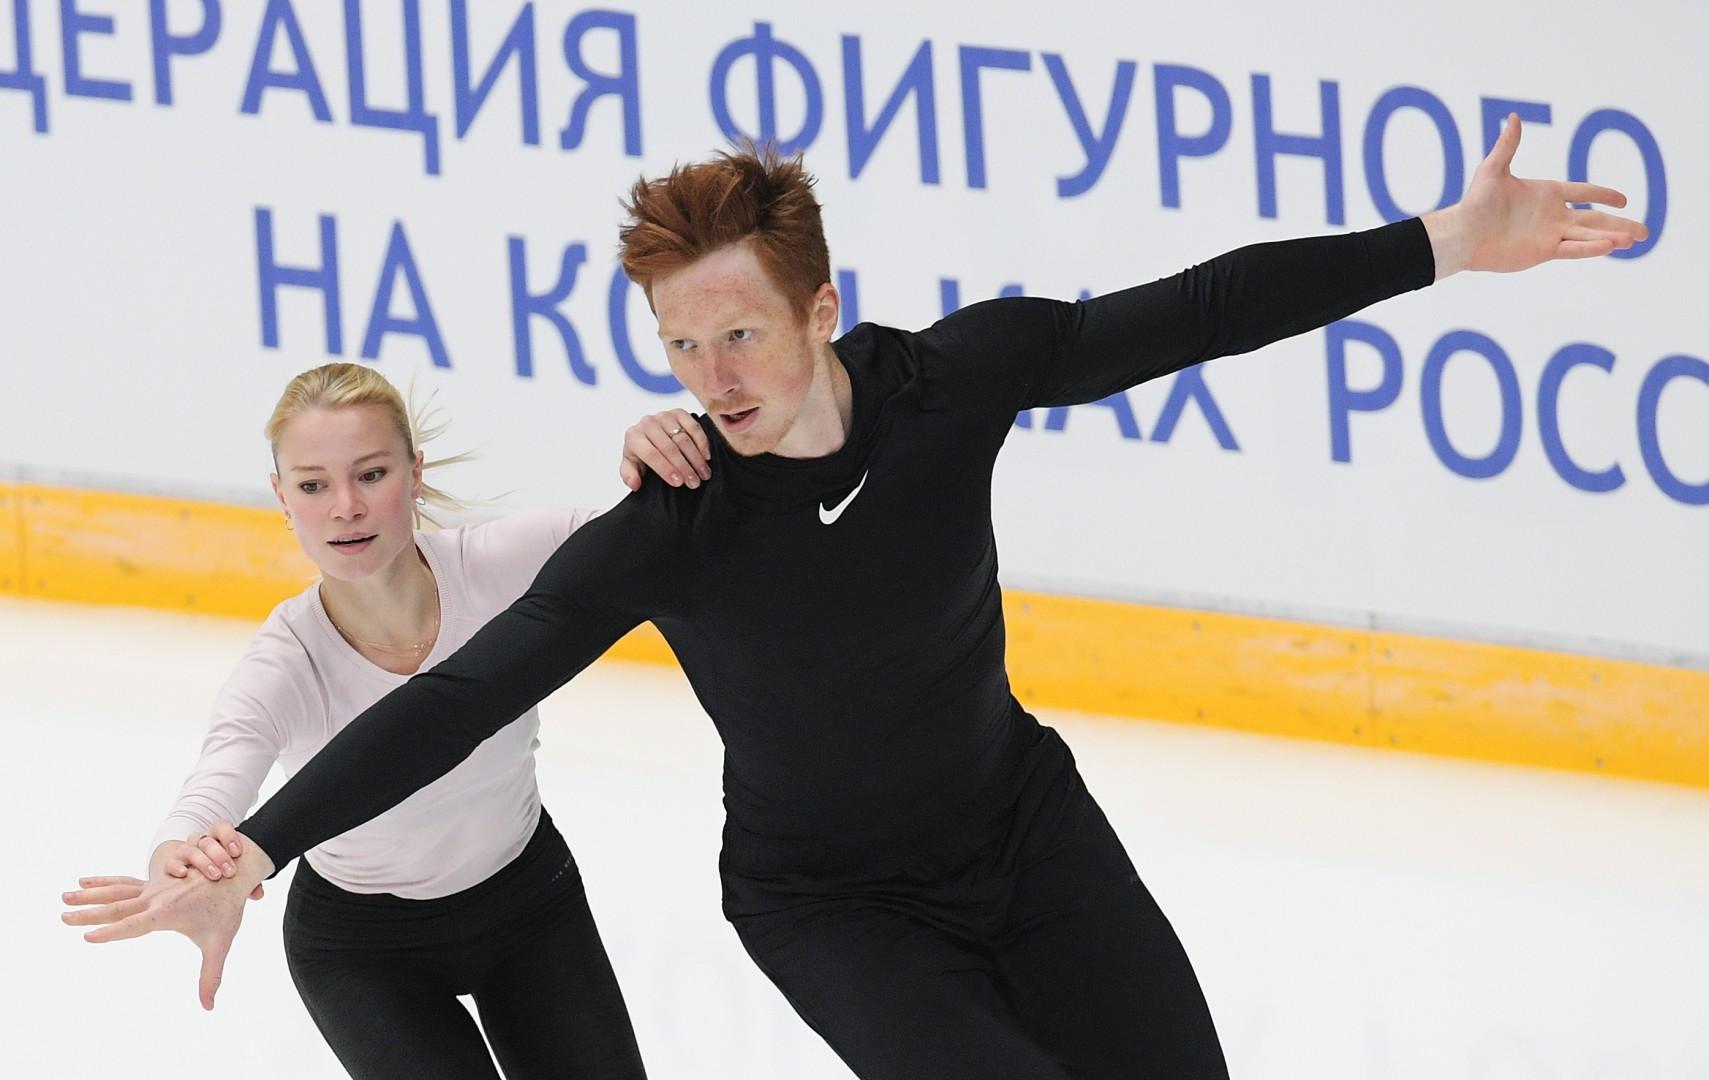 Евгения Тарасова - Владимир Морозов-2 - Страница 14 036M6we_3Zs